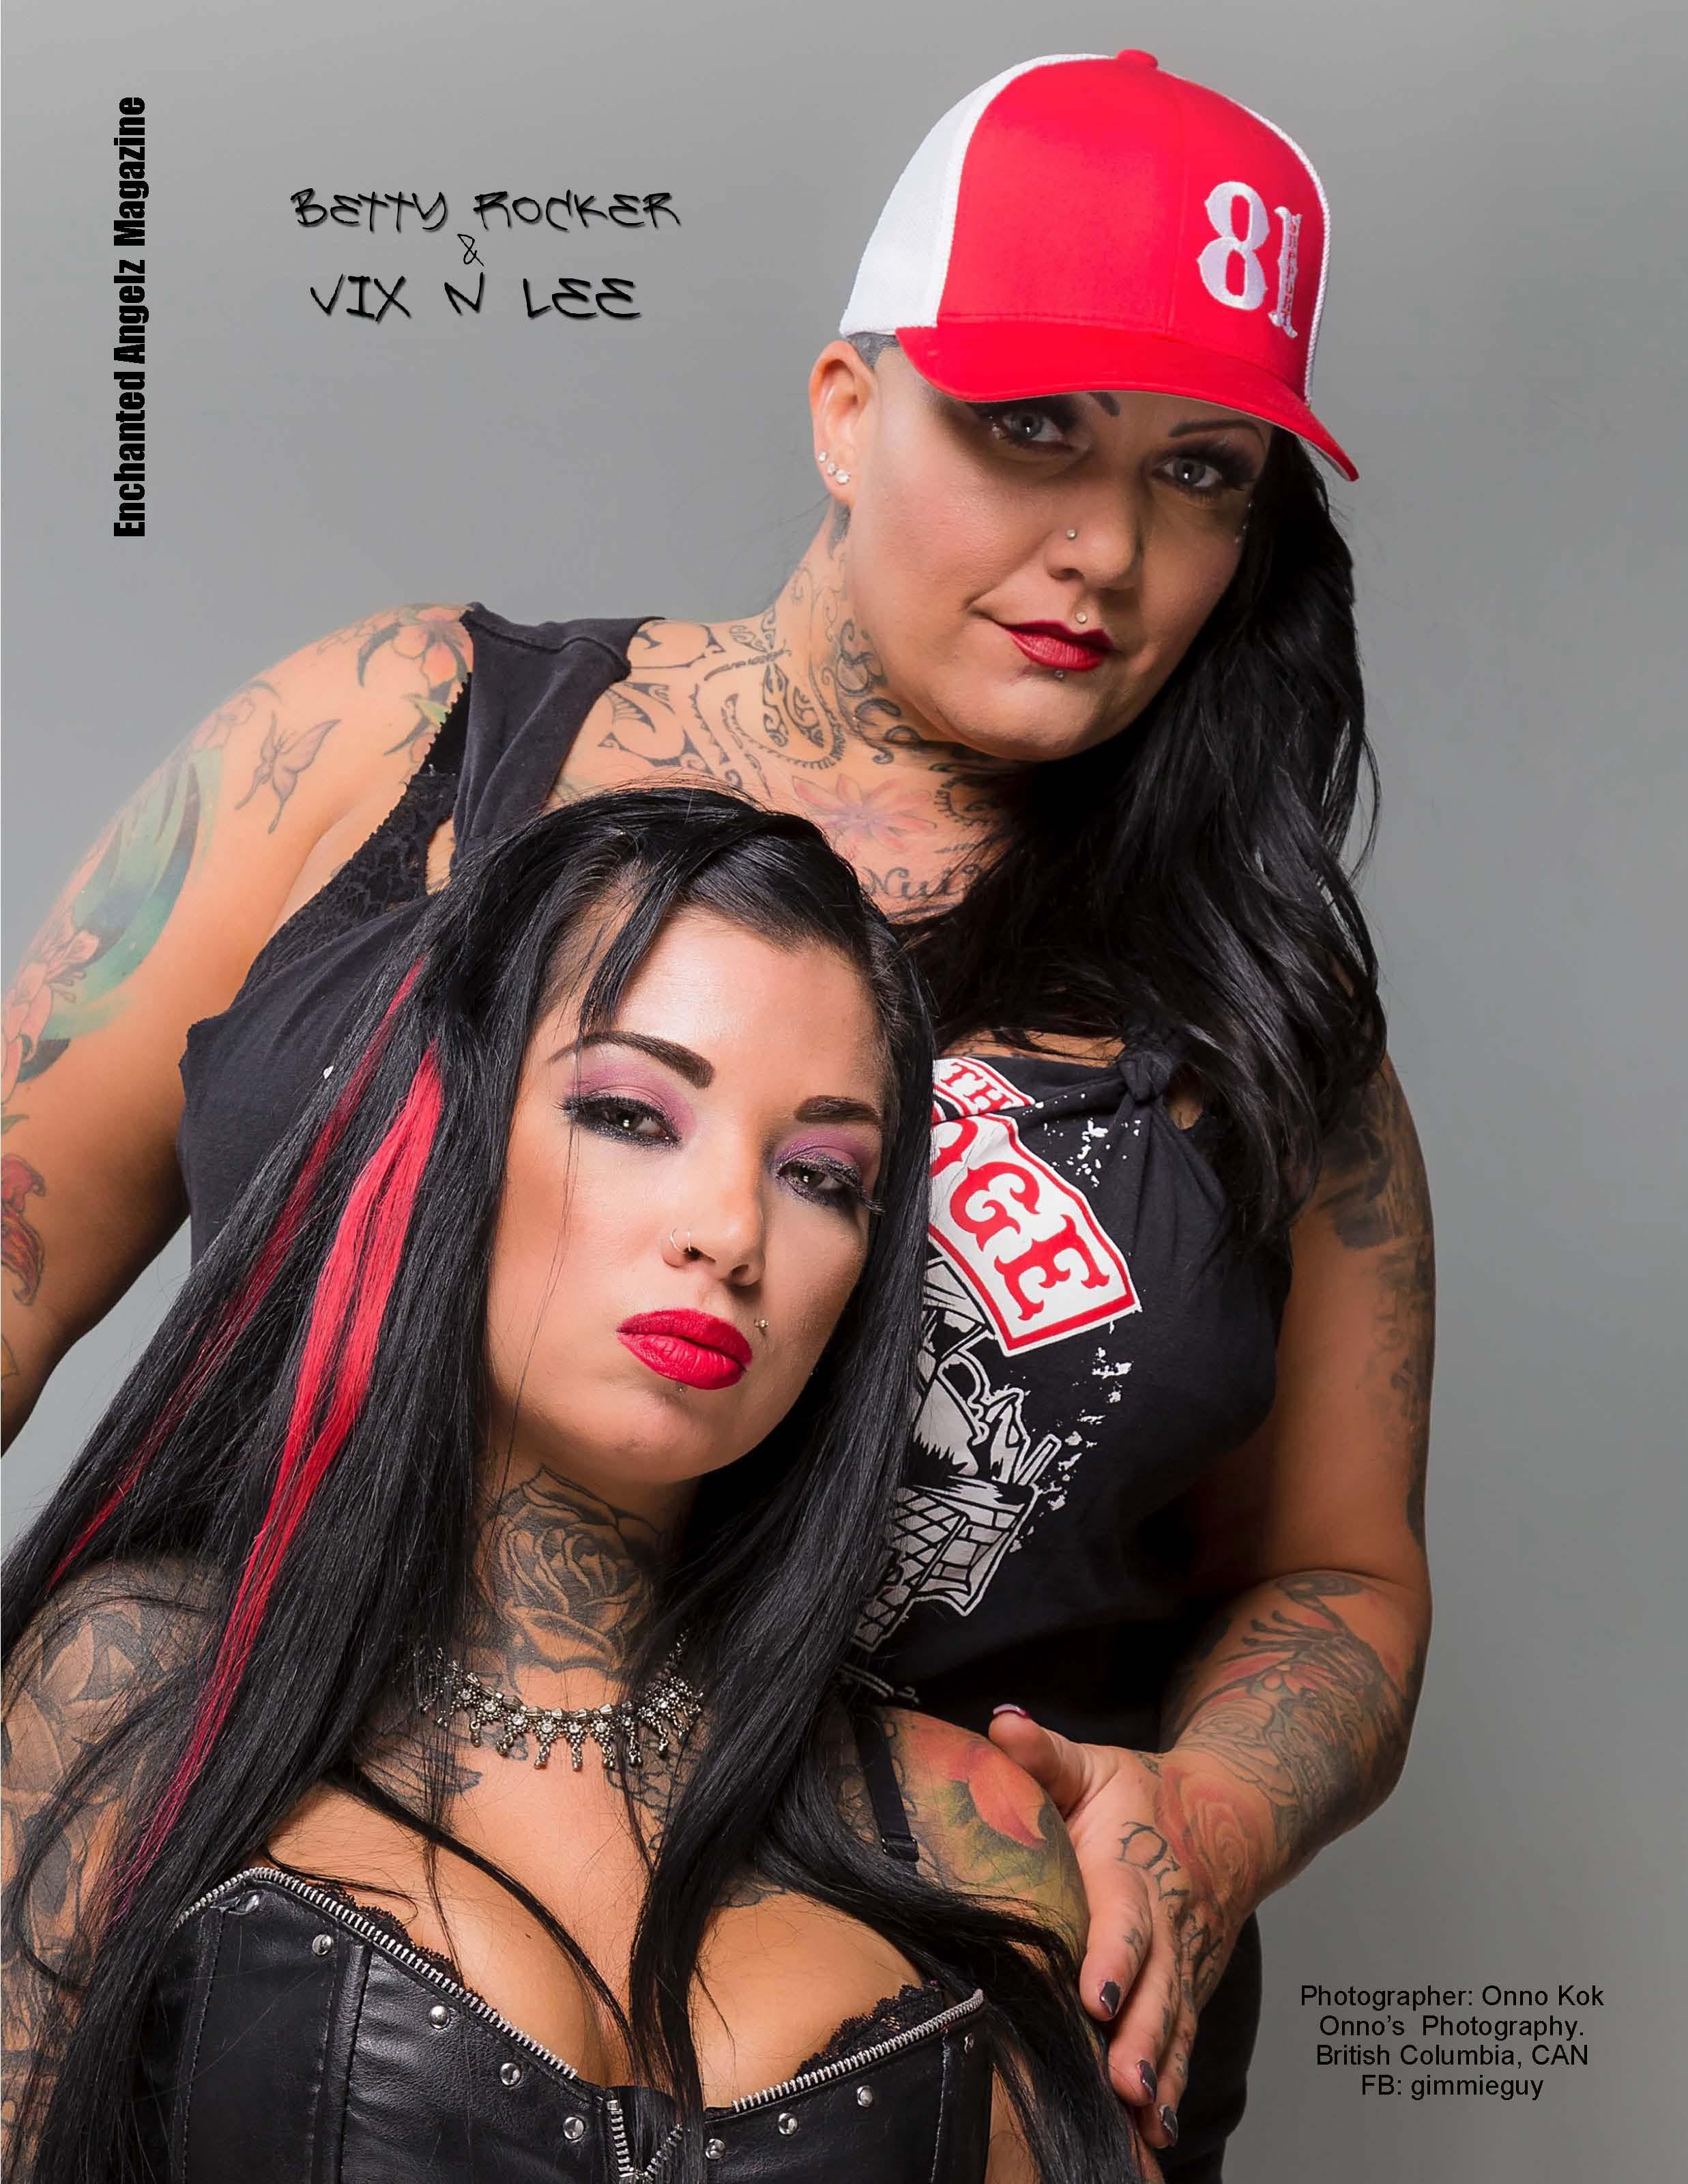 Betty & VixNLee - Oct 2017